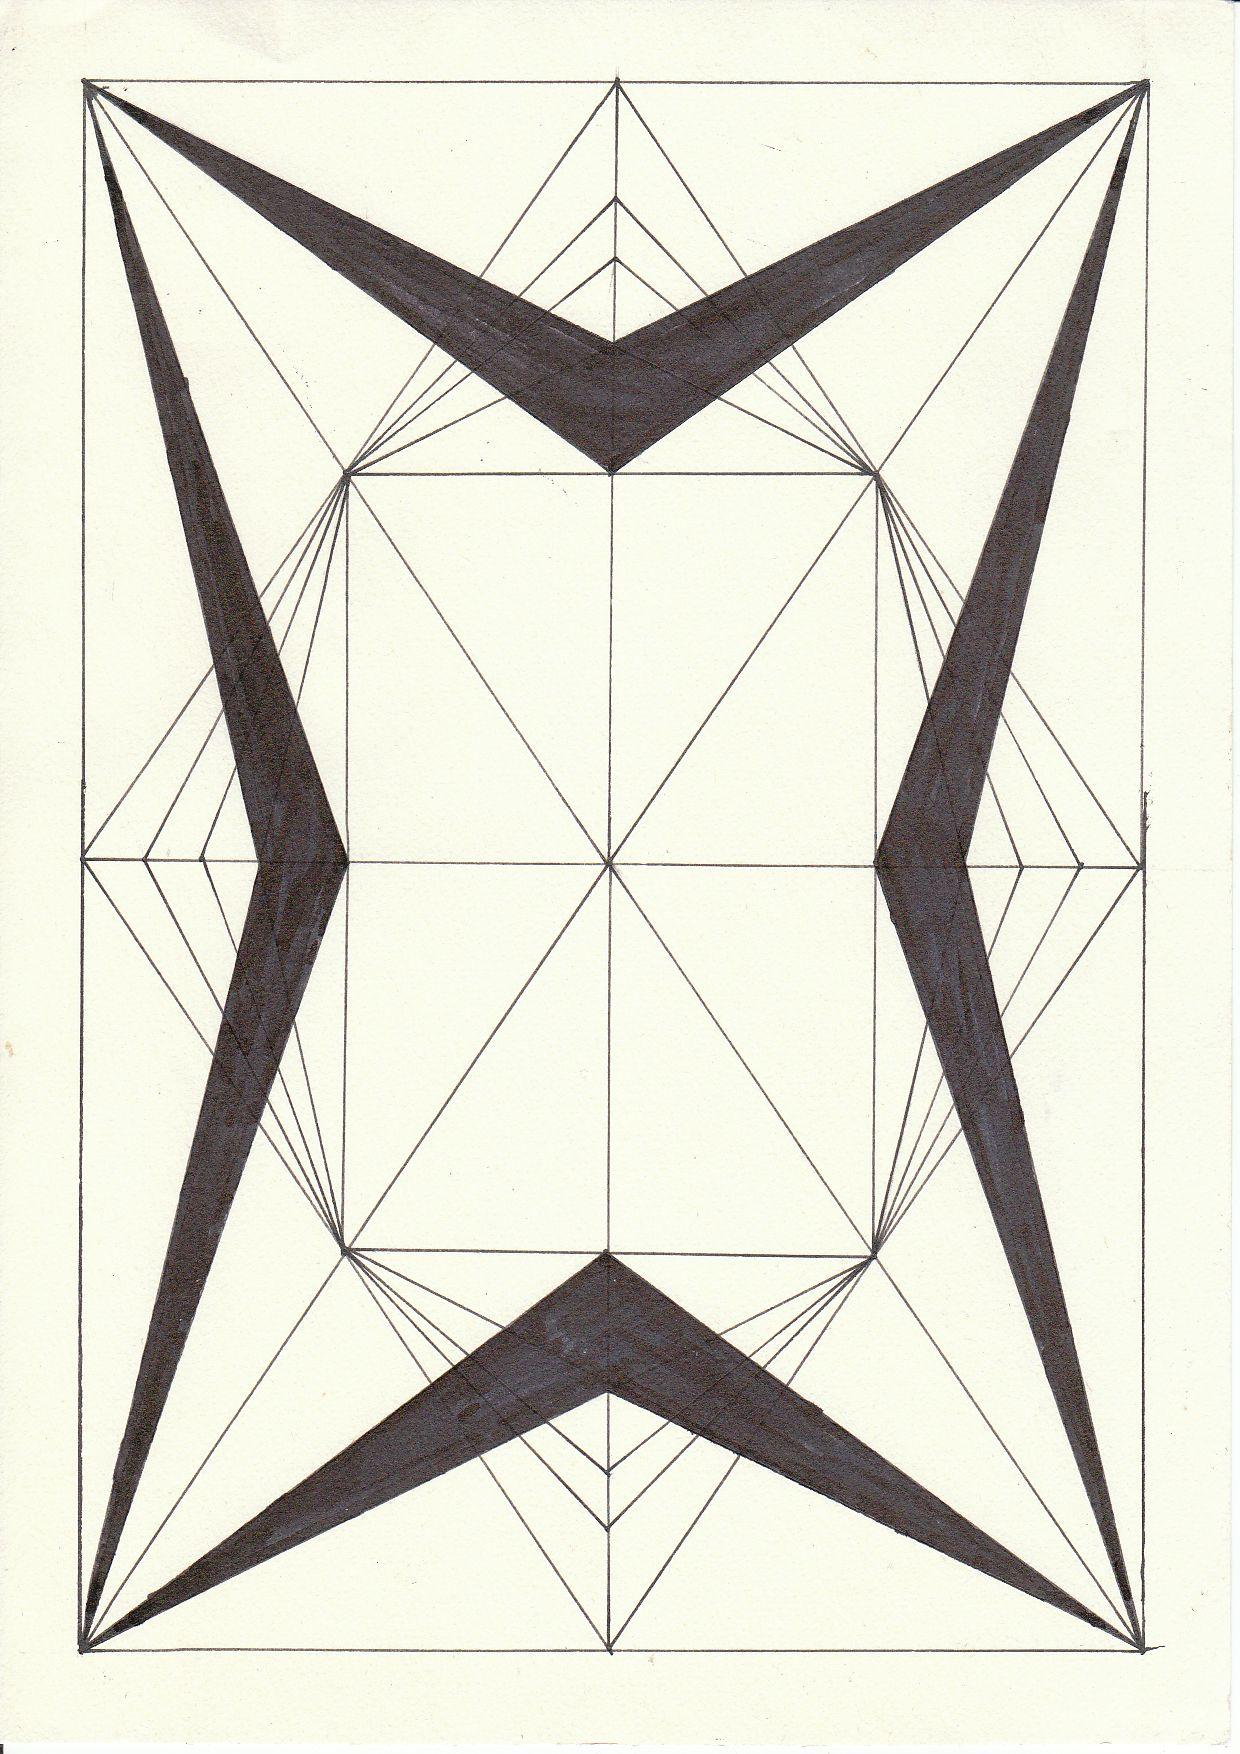 1240x1754 Triangles Drawing Etc. Etc. Etc.